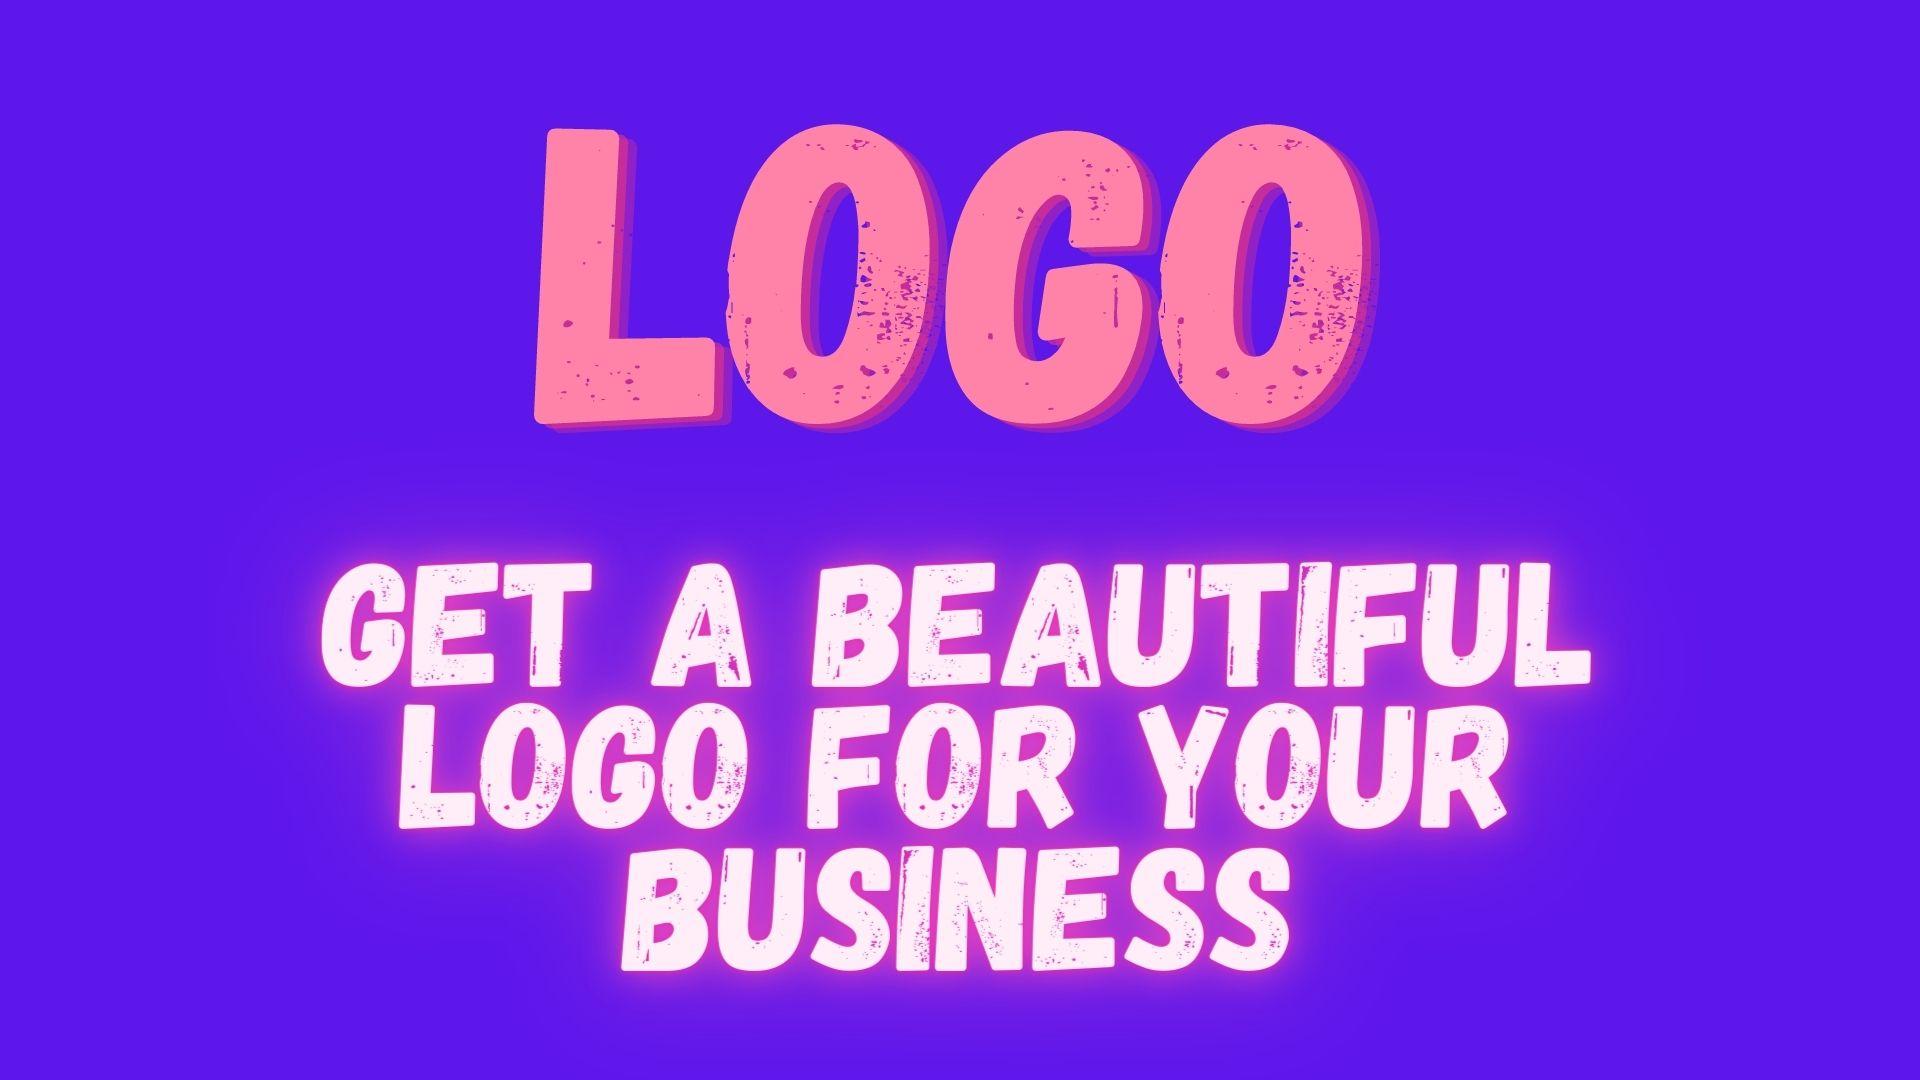 I wii give you a beautiful logo